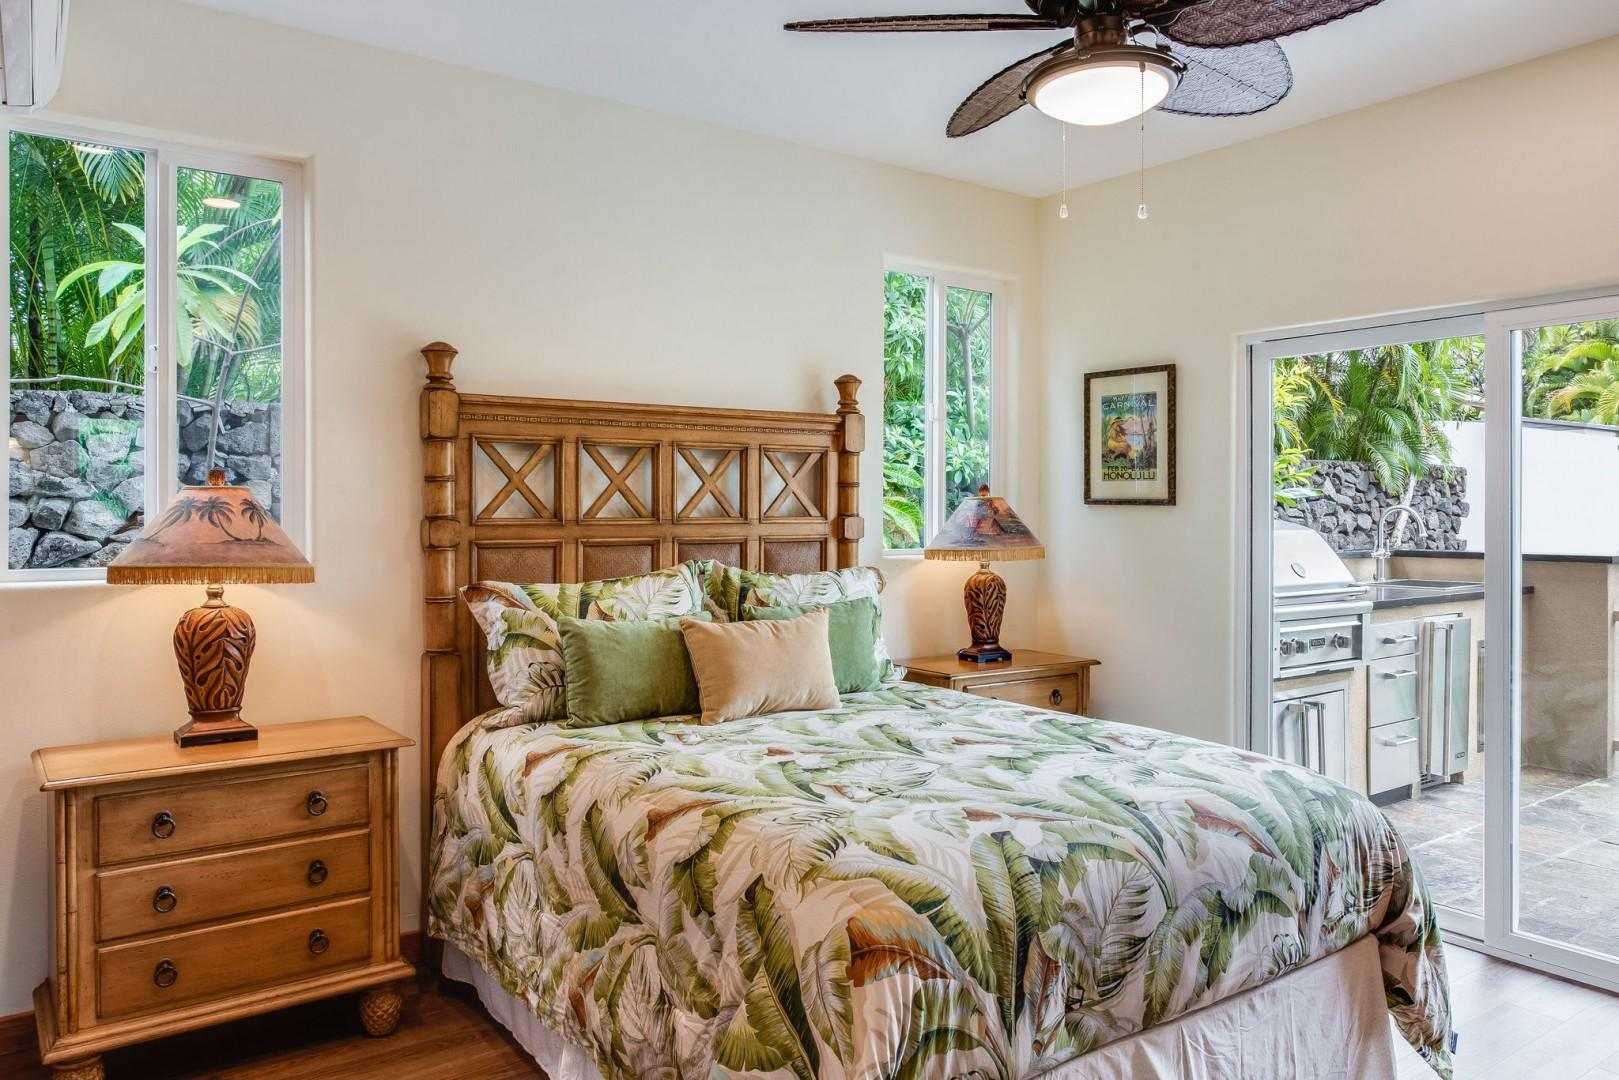 Hale Moku Master bedroom with Lanai Access